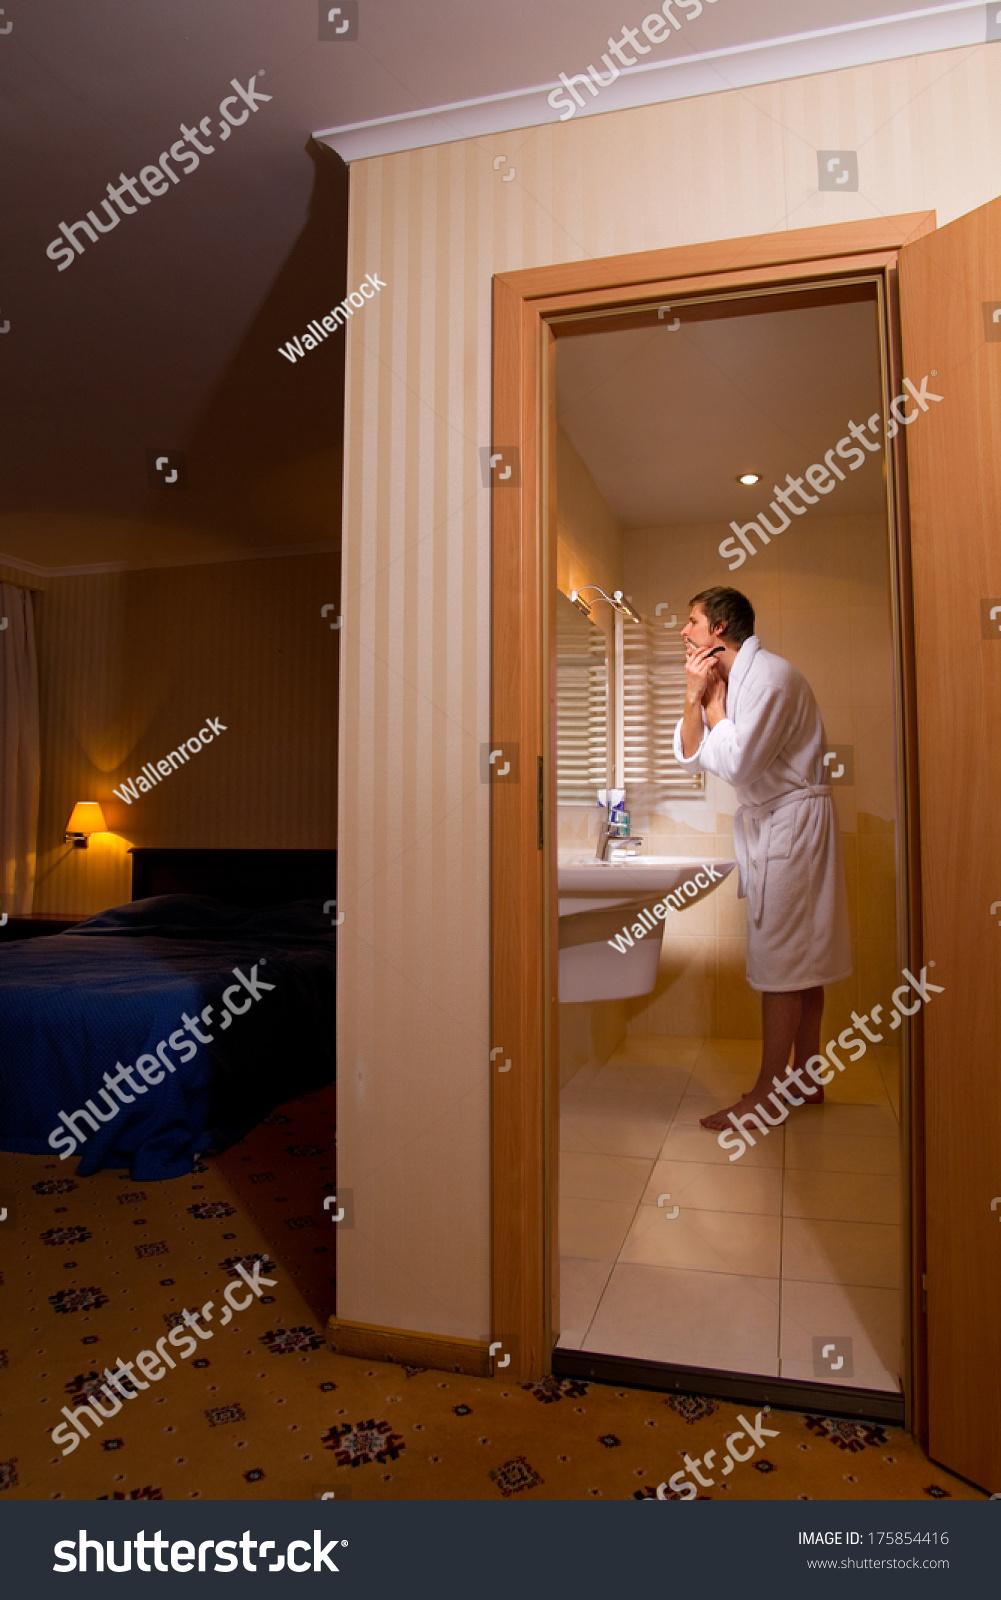 man shaving bathroom going out stock photo 175854416 - shutterstock